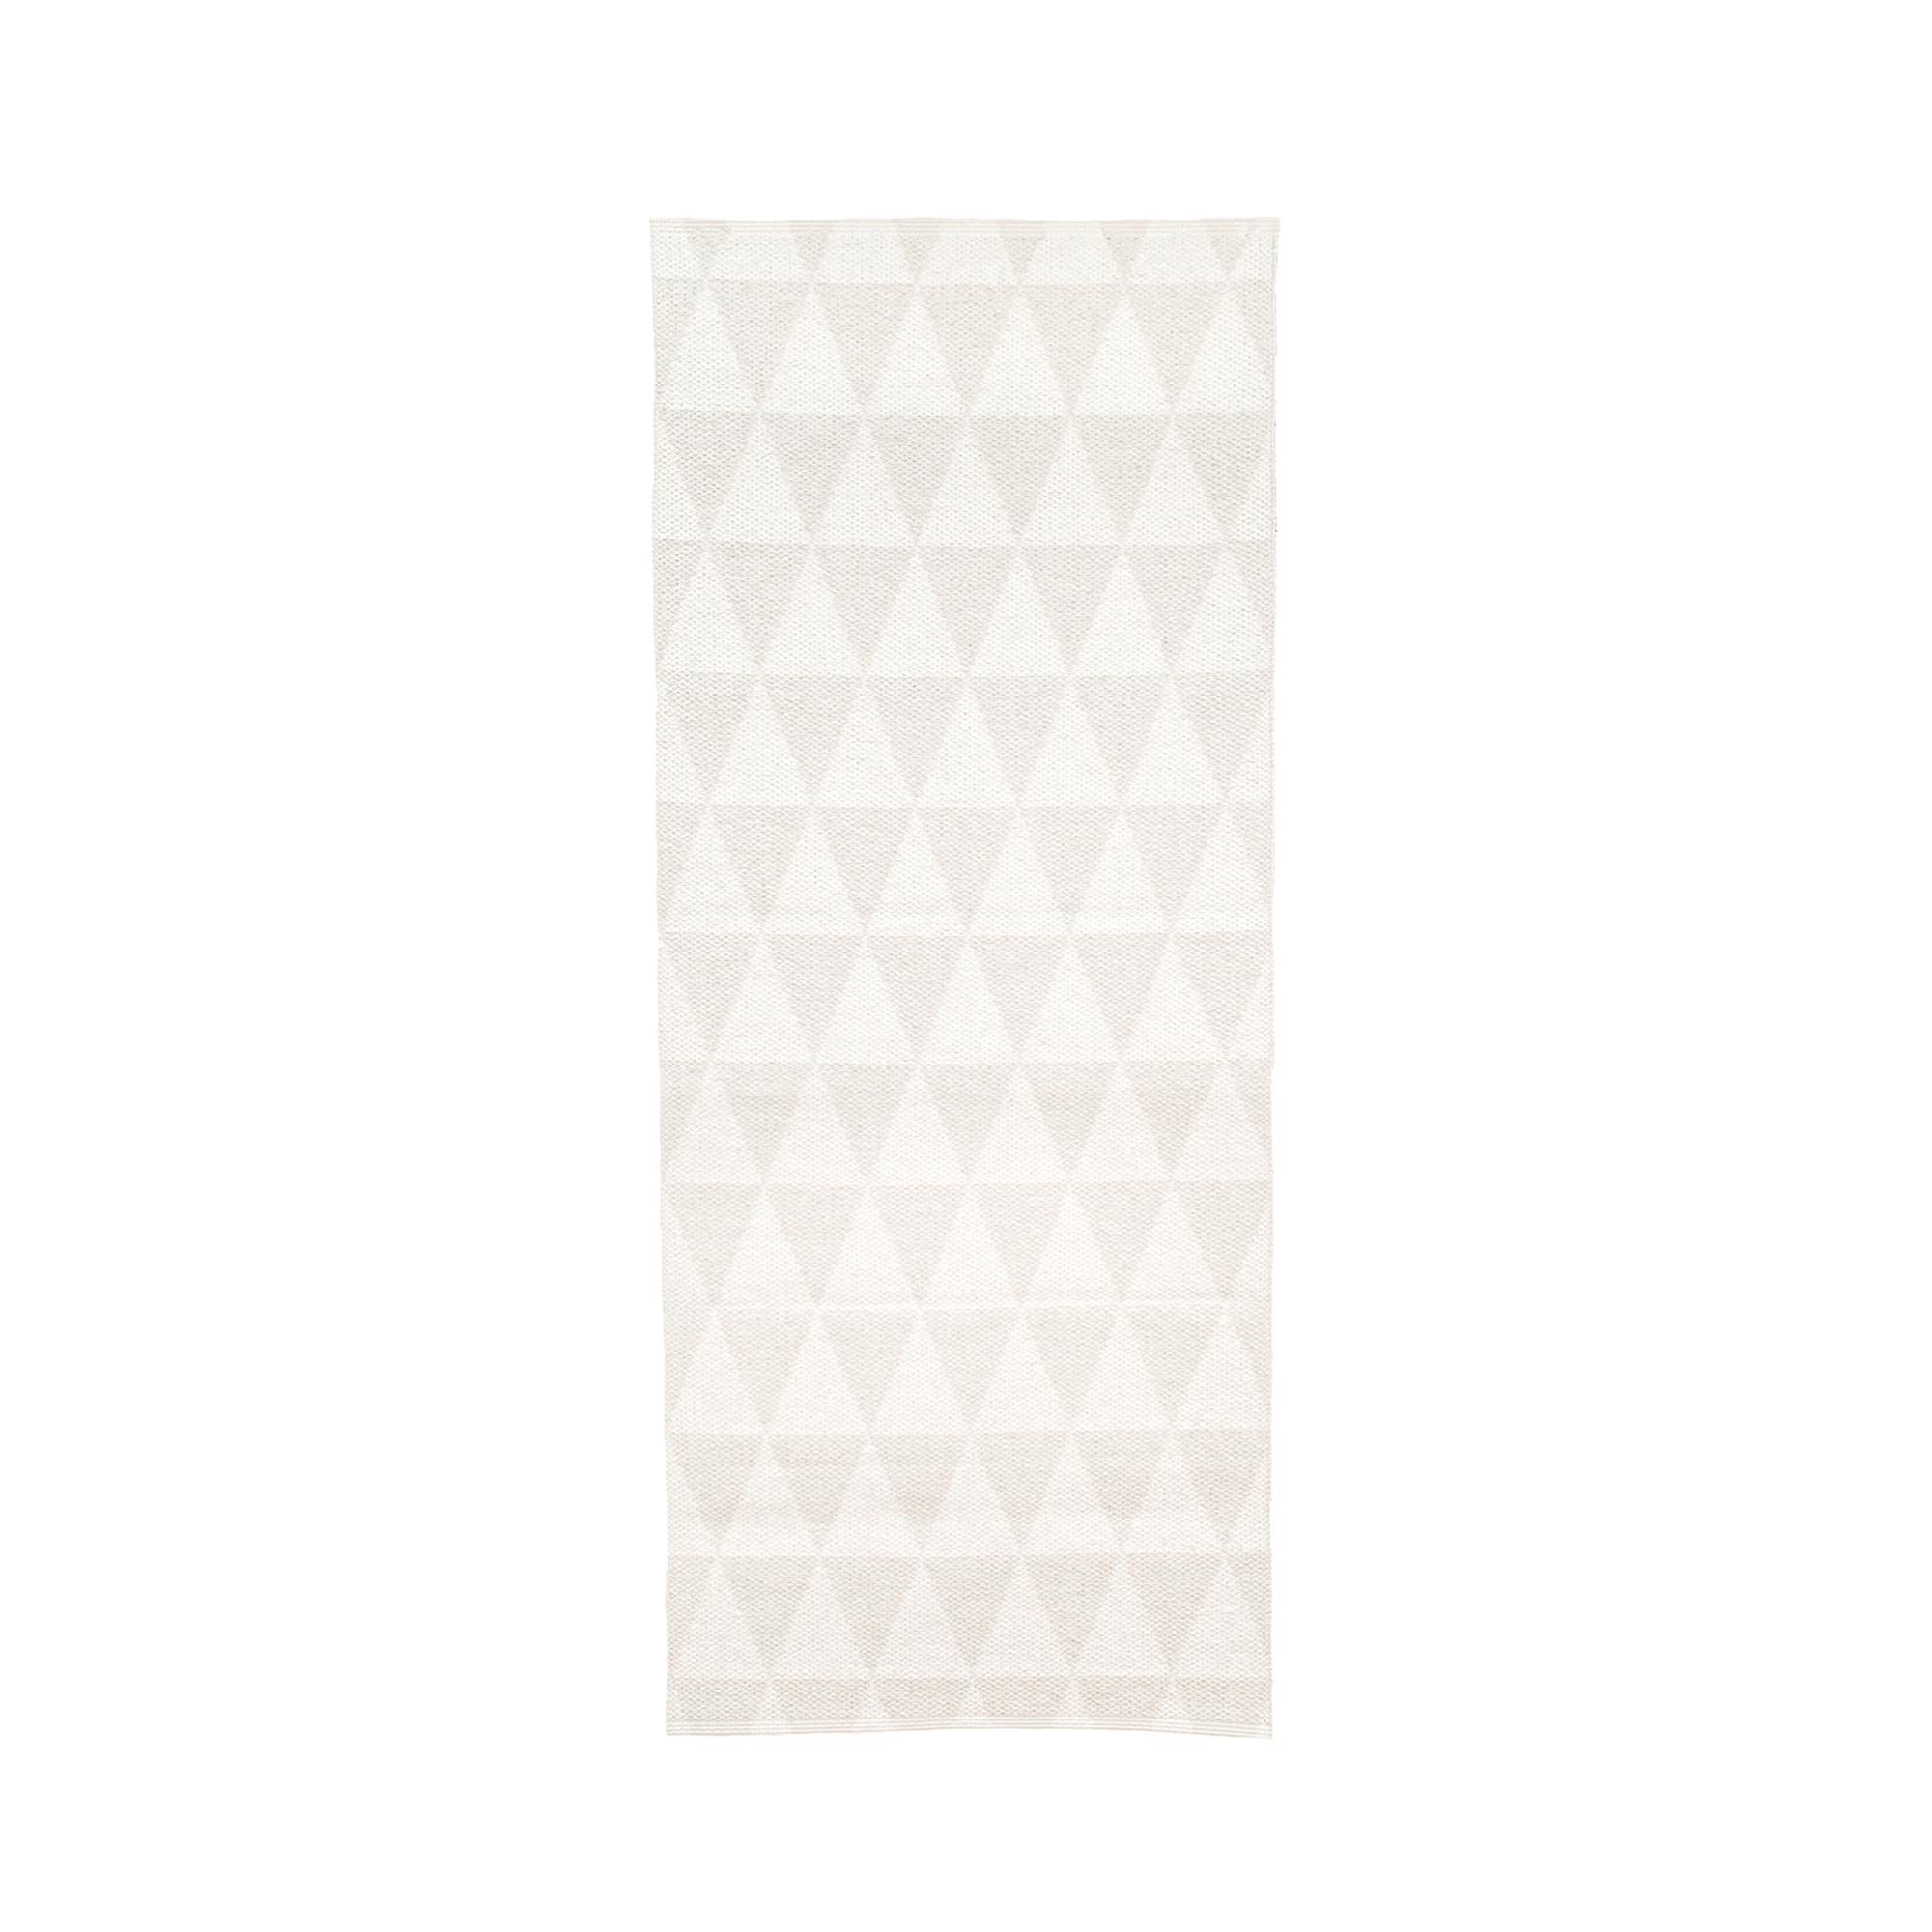 Designtorget Plastmatta Assar 200 vit/vit